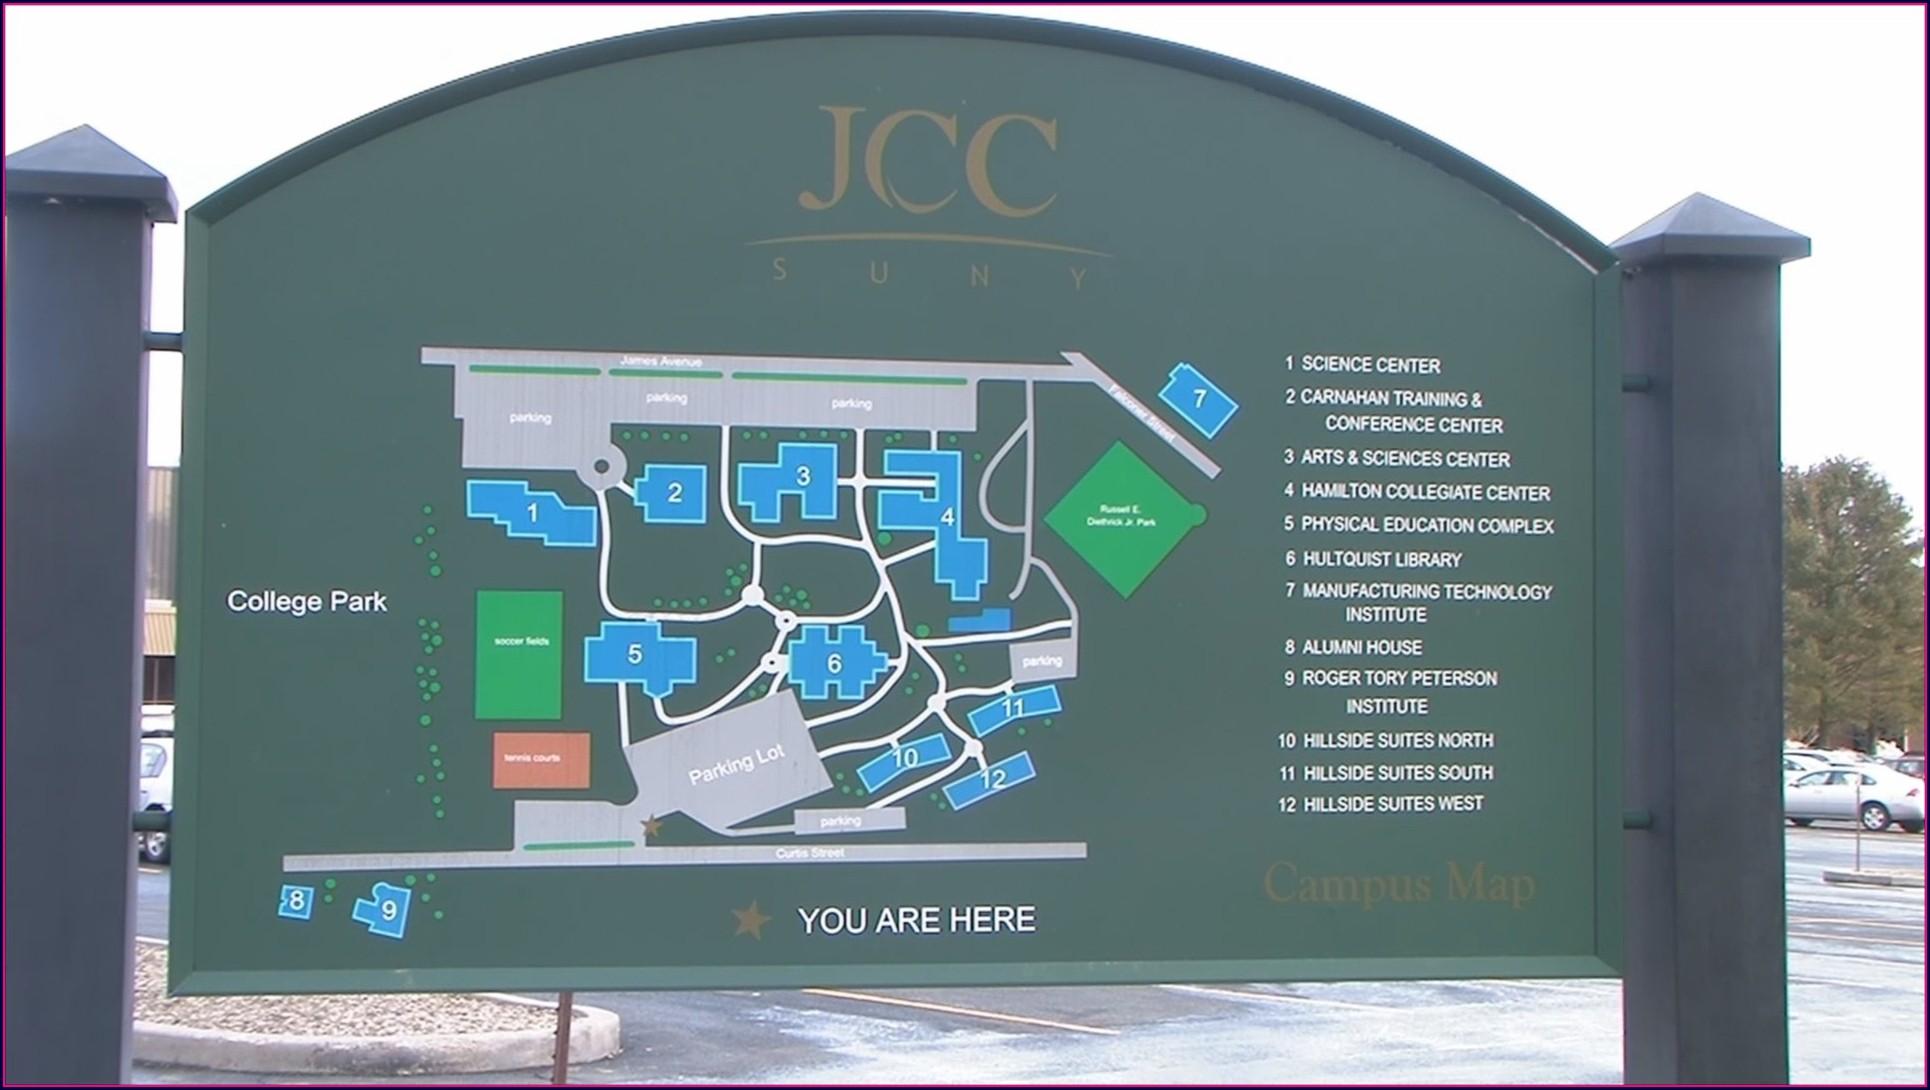 Jcc Campus Map Jamestown Ny